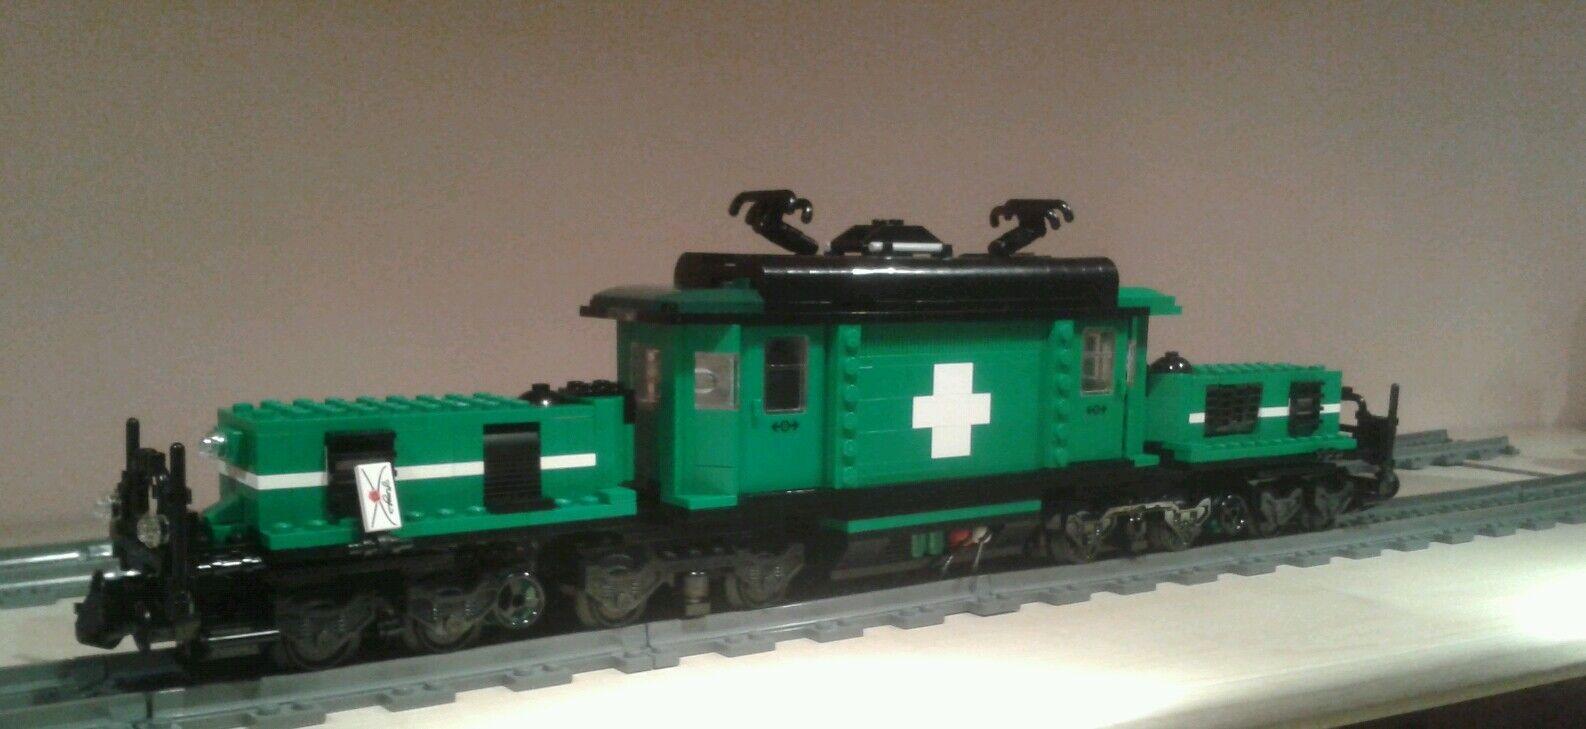 Lego ® City ferrocarril verde cocodrilo XL MOC RC bricktrain 10183